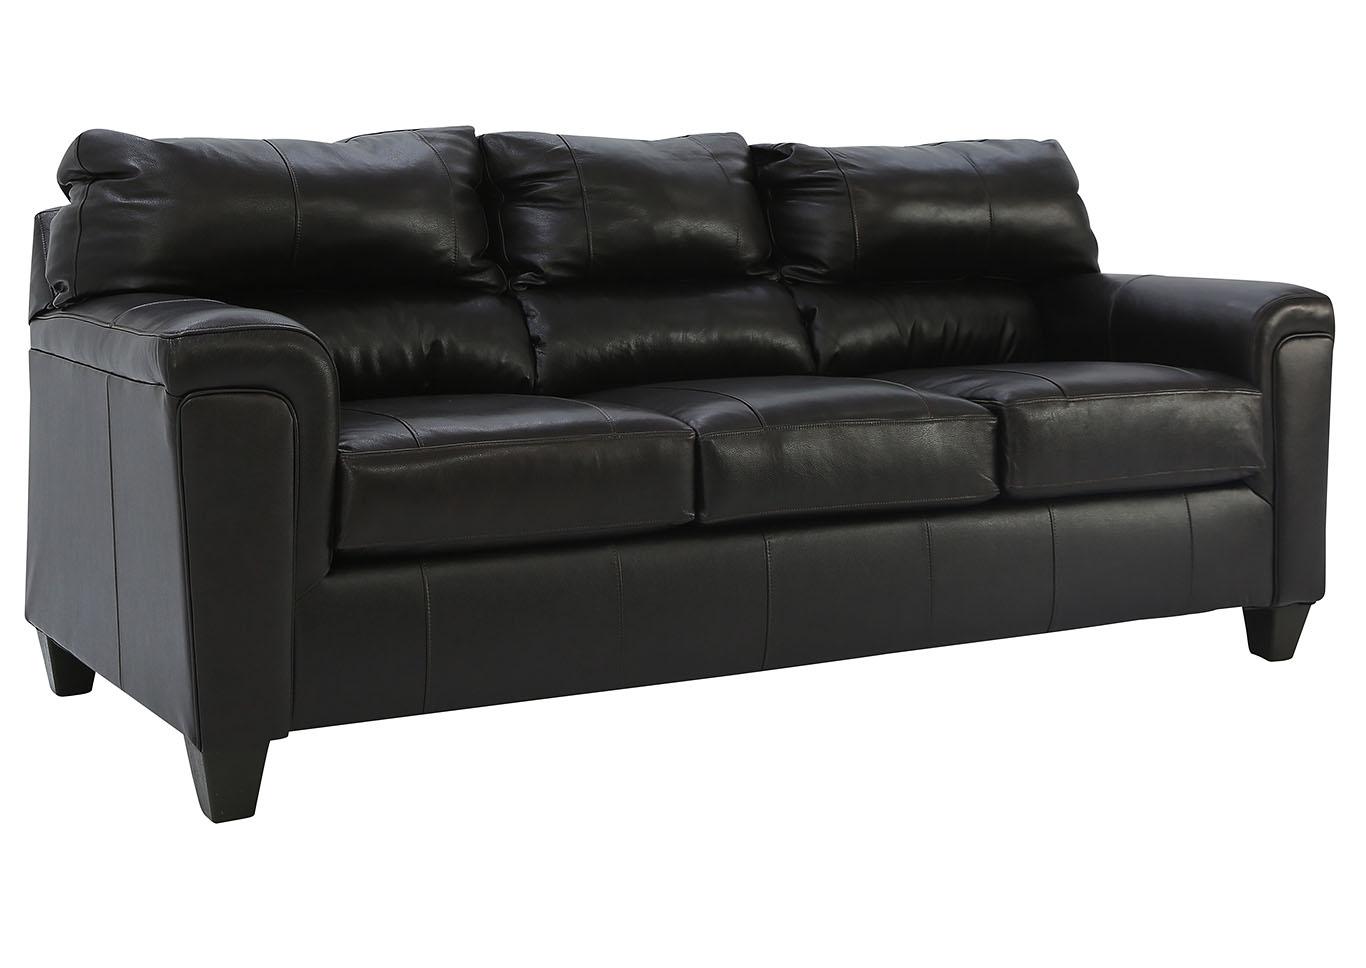 Tremendous Ivan Smith Emilia Bark Top Grain Leather Sofa Home Interior And Landscaping Dextoversignezvosmurscom